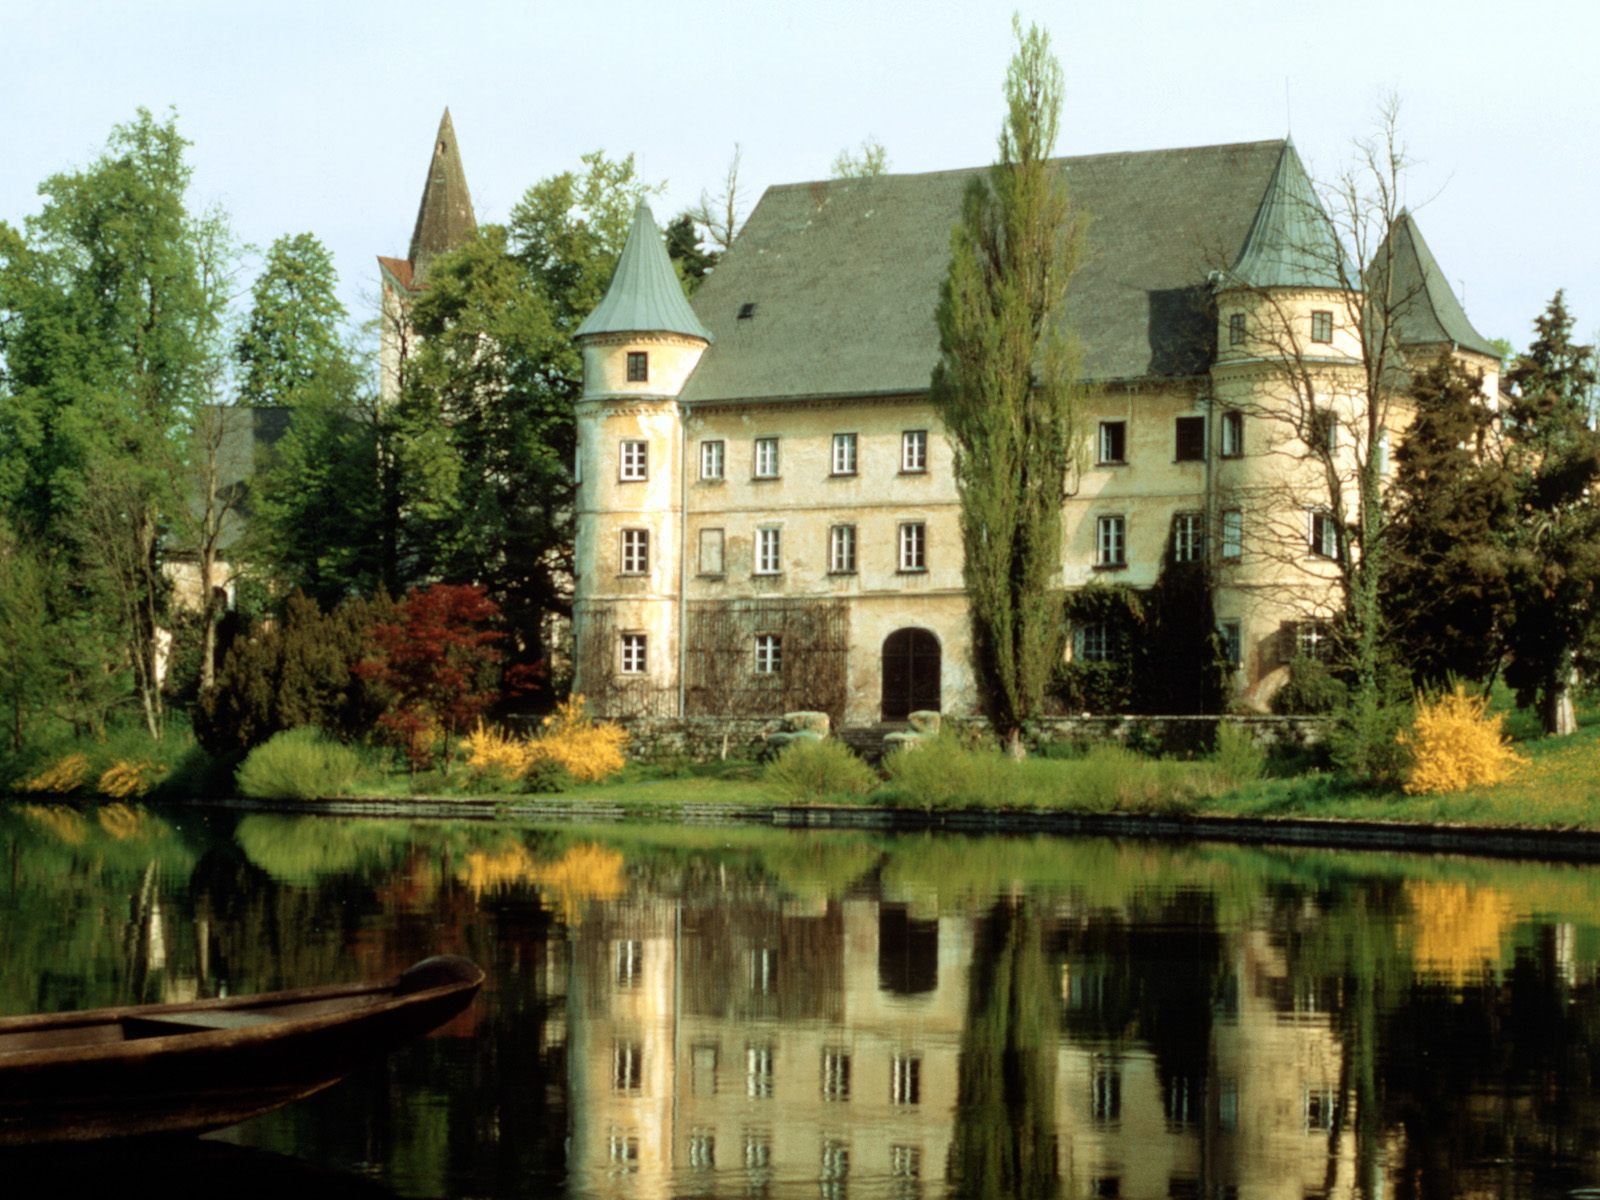 http://3.bp.blogspot.com/_hSpIx9LK9_g/S_DlY5kRoMI/AAAAAAAAAHQ/ygvJU8VI-IA/s1600/Hagenau-Castle-Austria.jpg